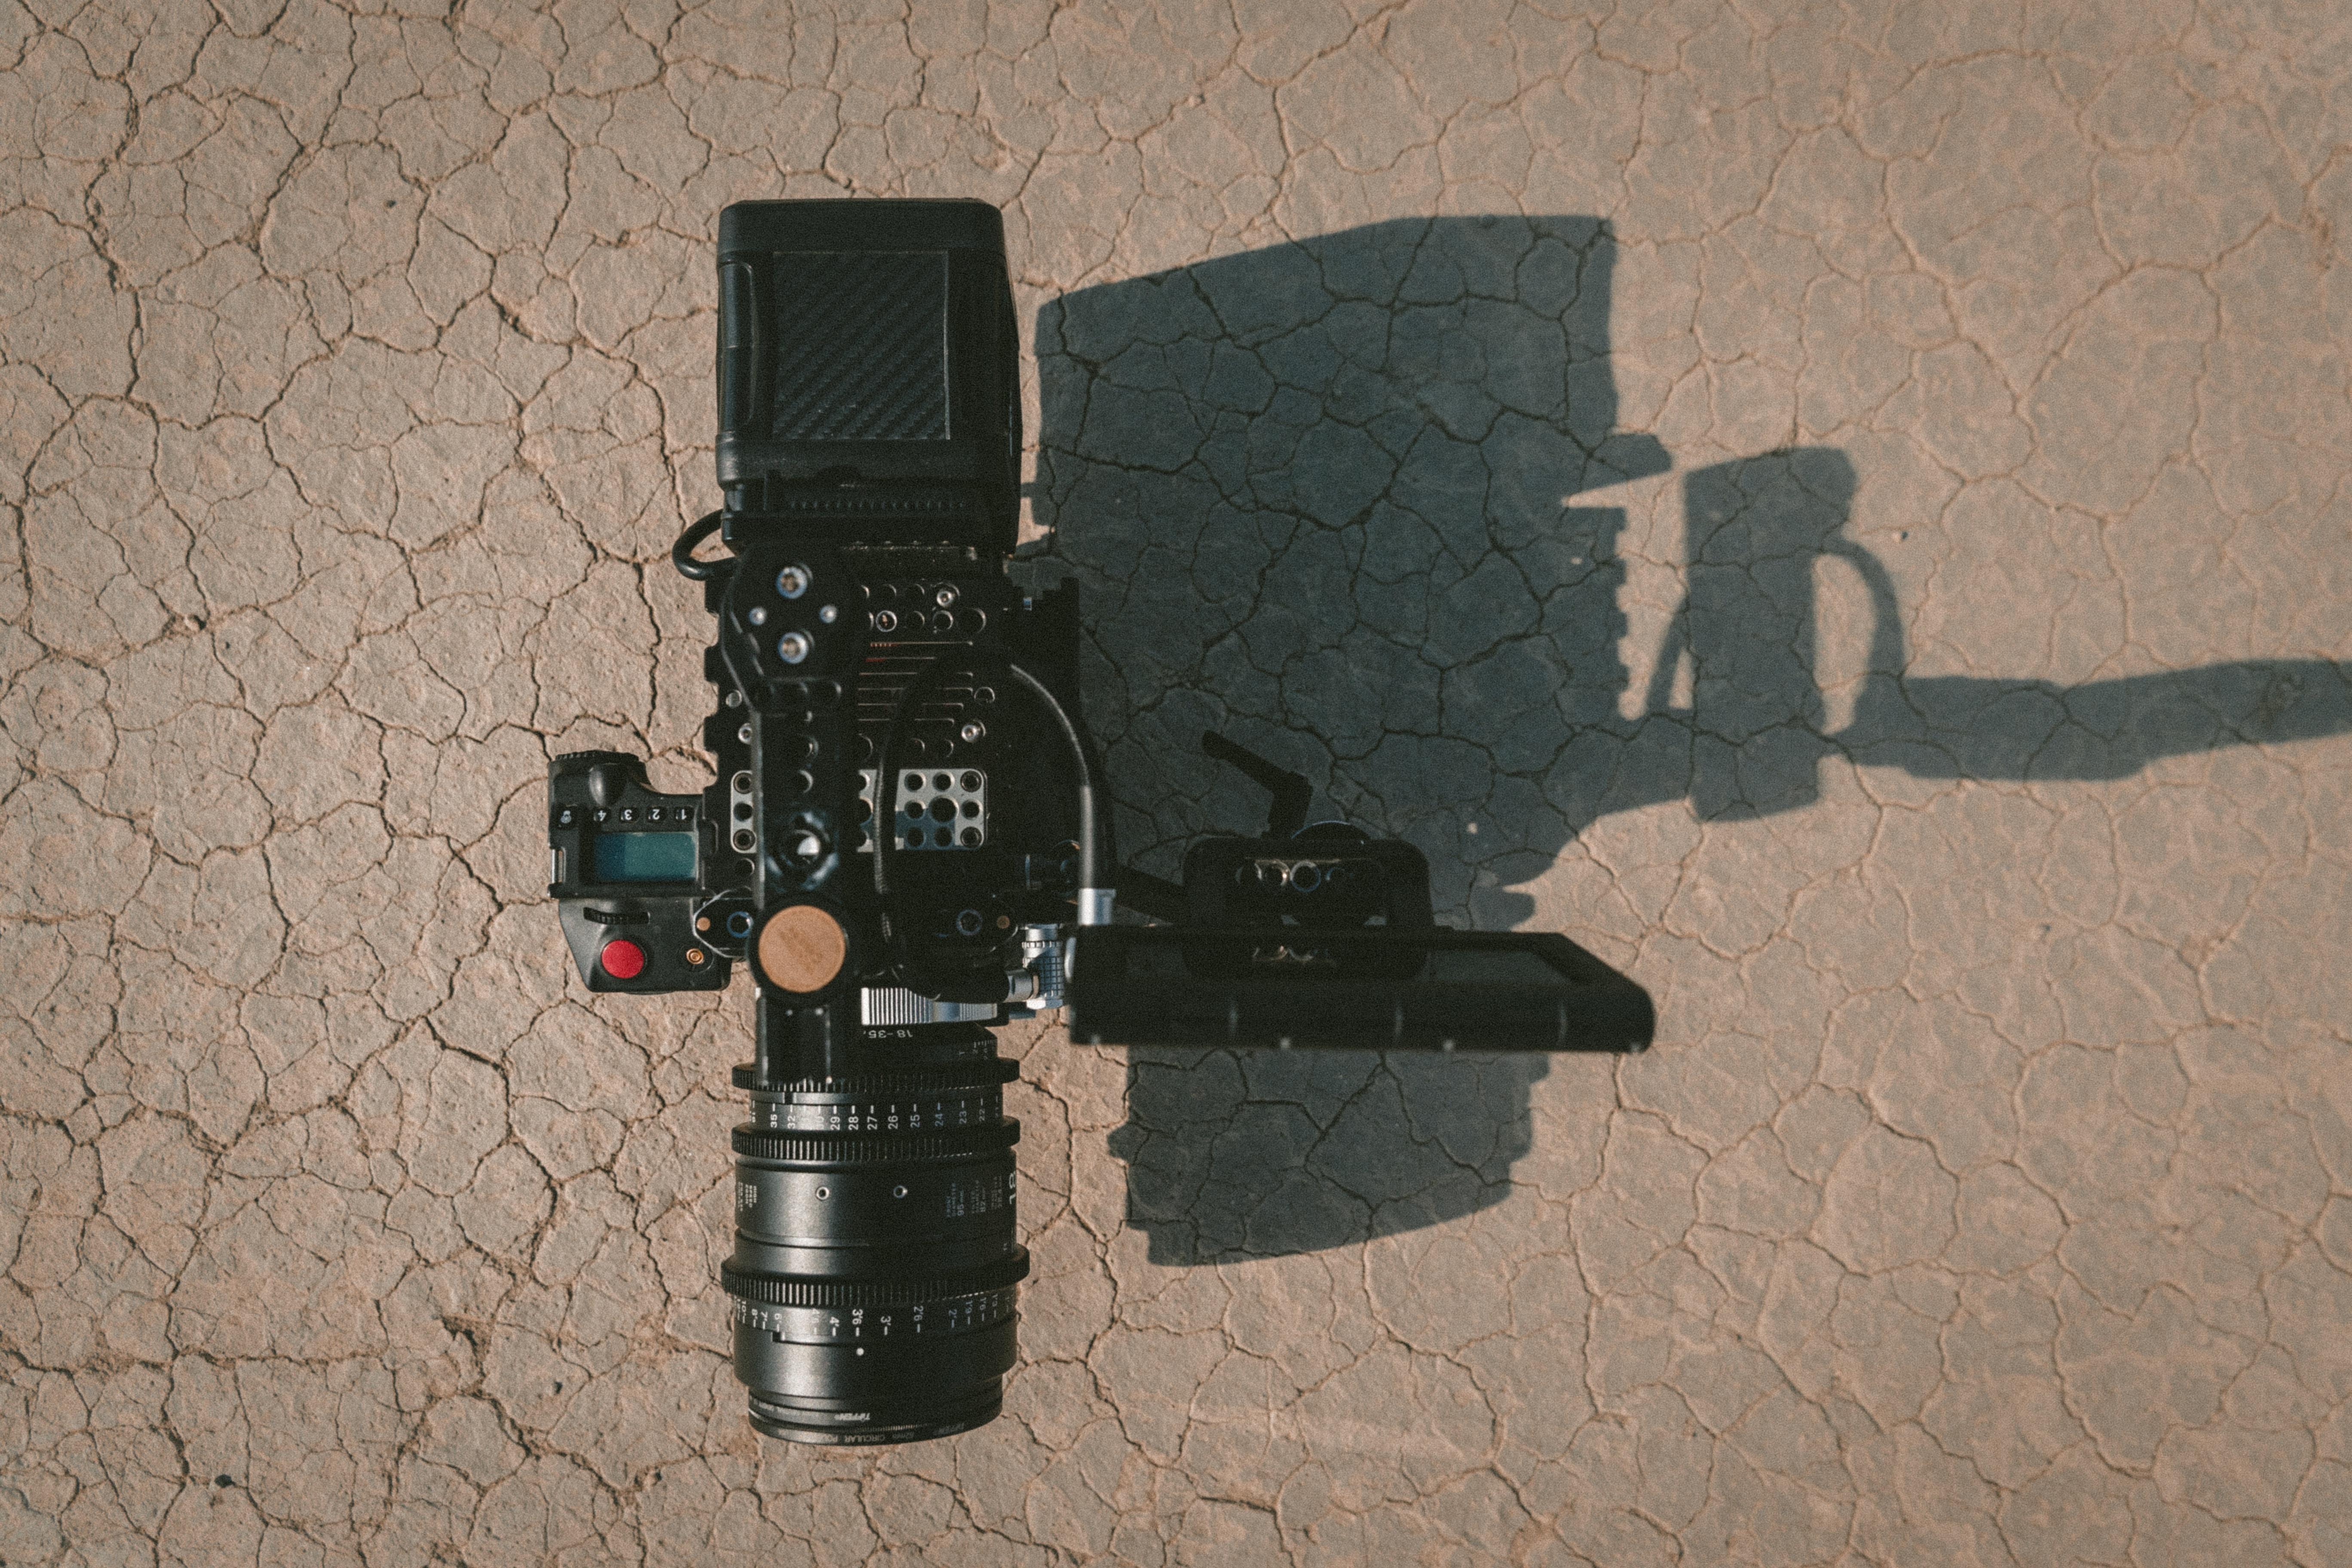 black DSLR camera on brown dirt